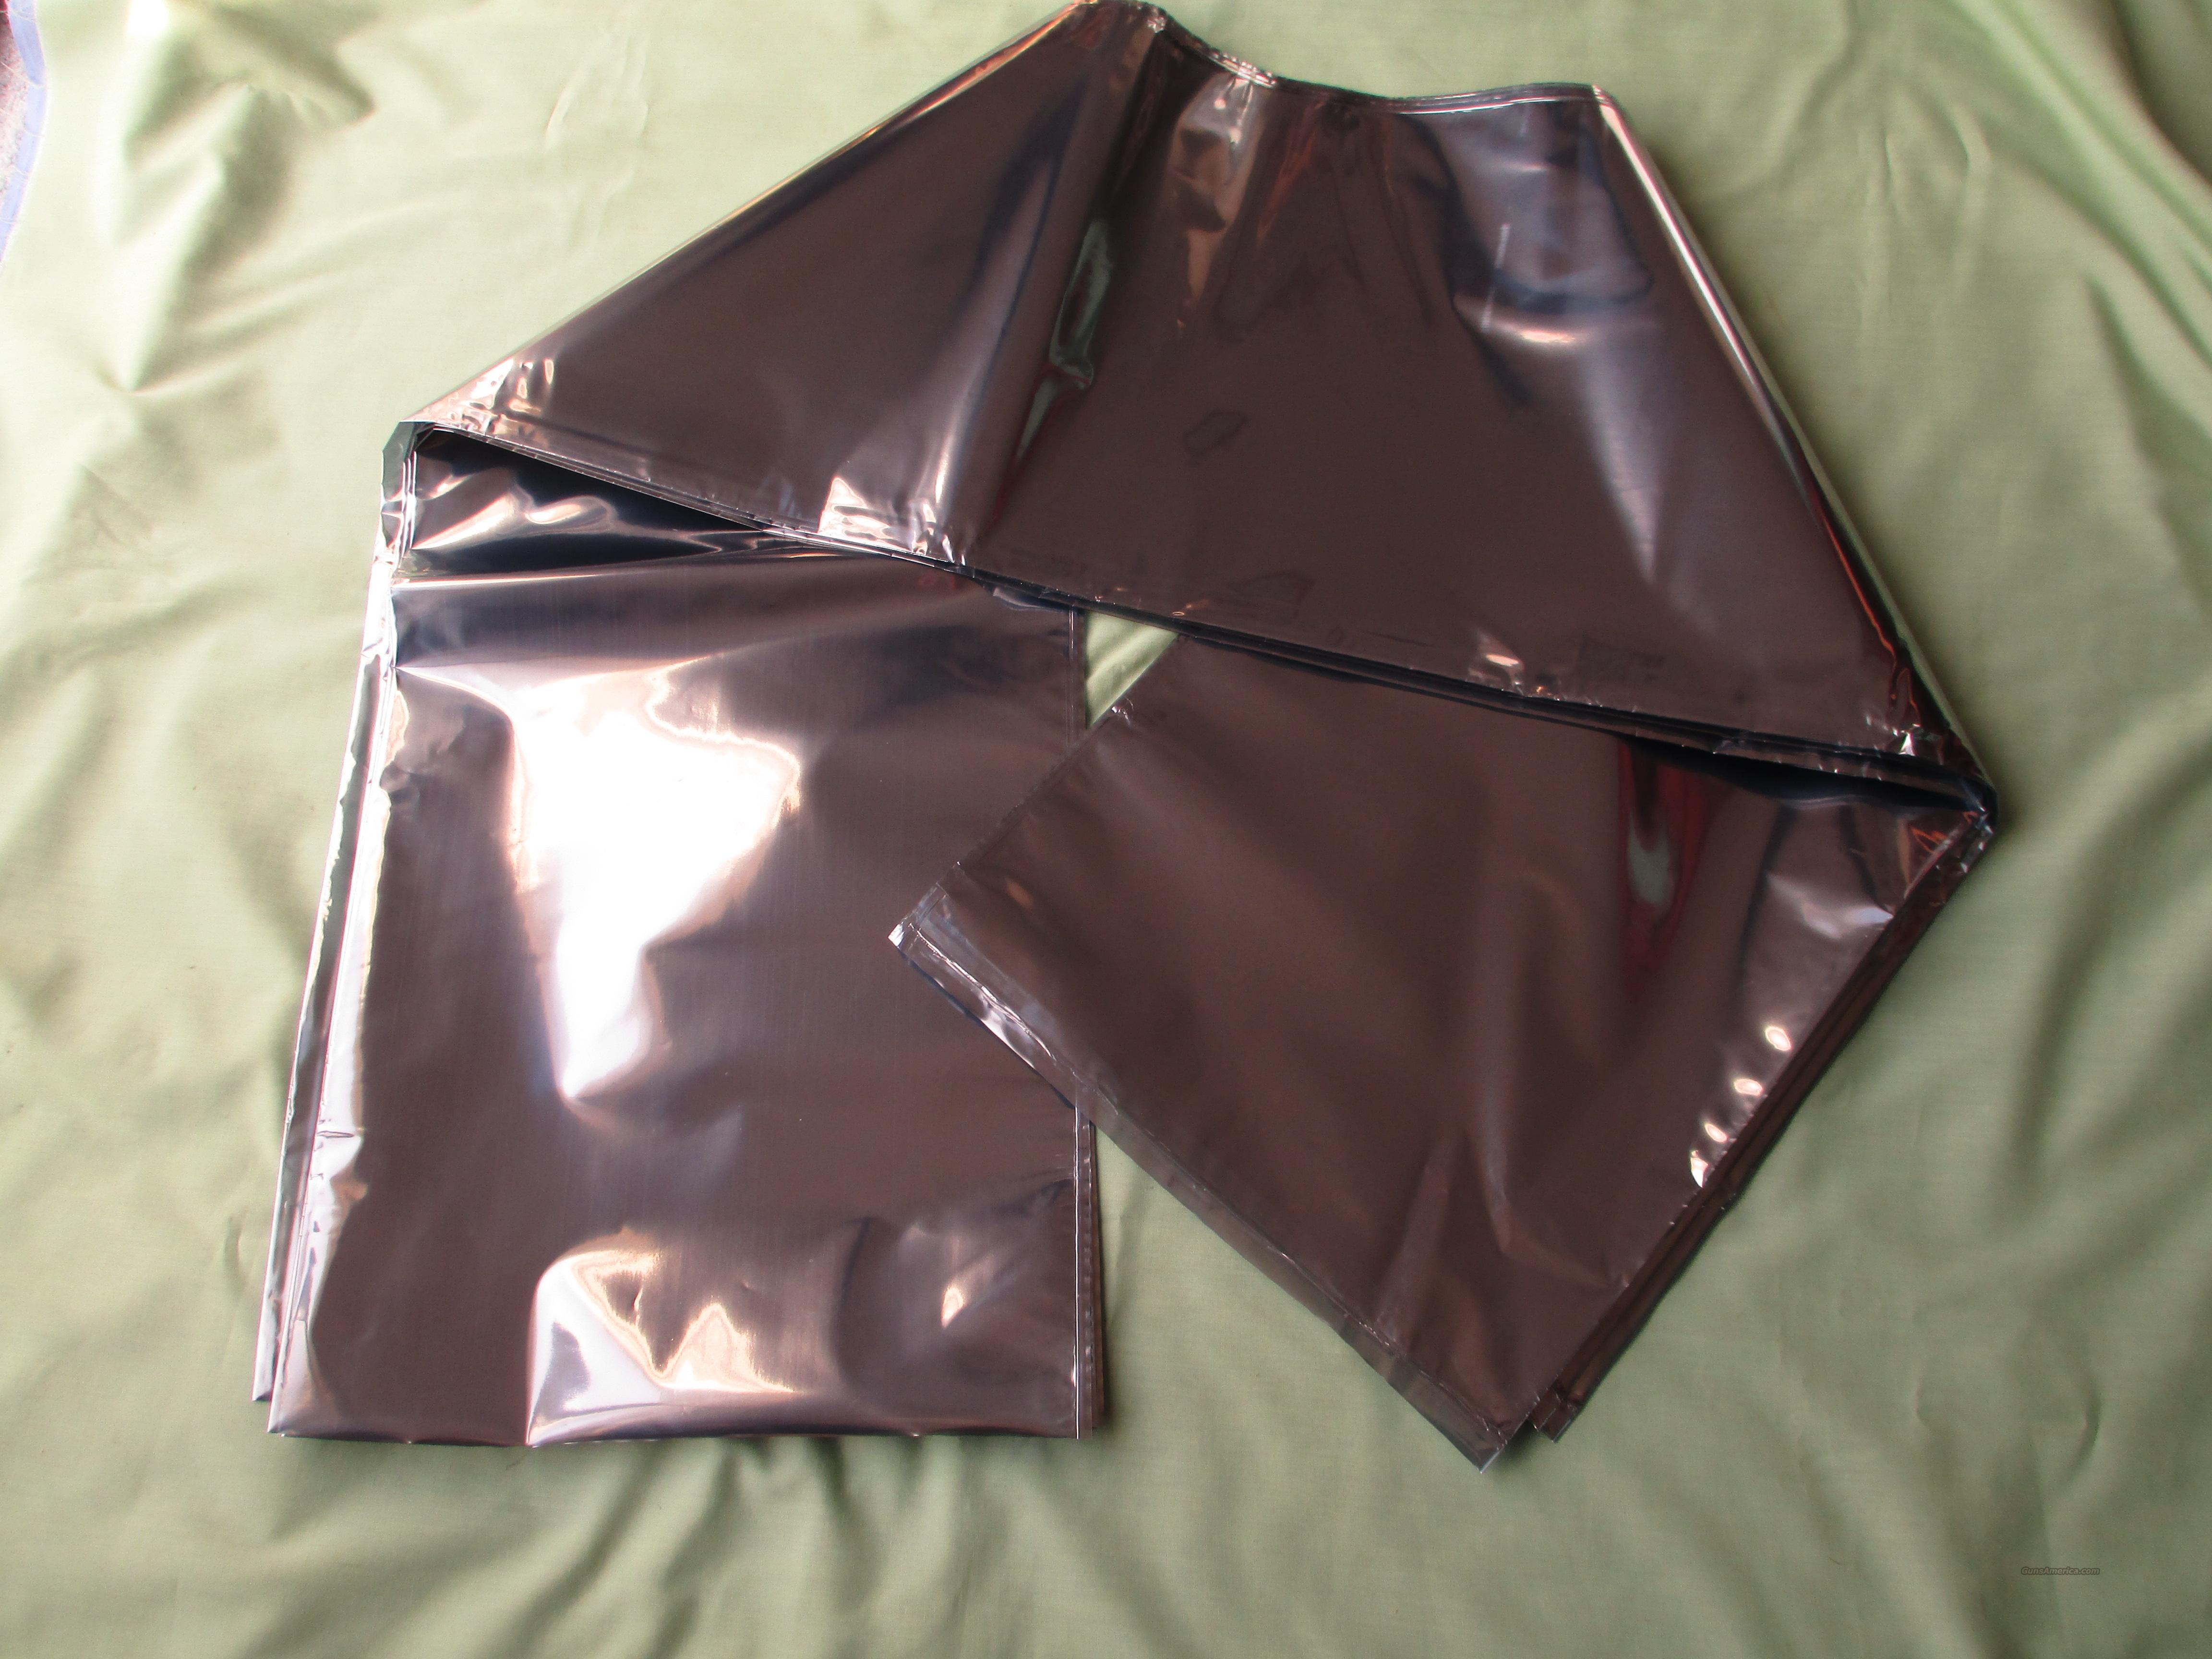 BROWNELLS - TRIPLE TOUGH™ PREMIUM STORAGE BAGS 6 PK.  Non-Guns > Gunsmith Tools/Supplies